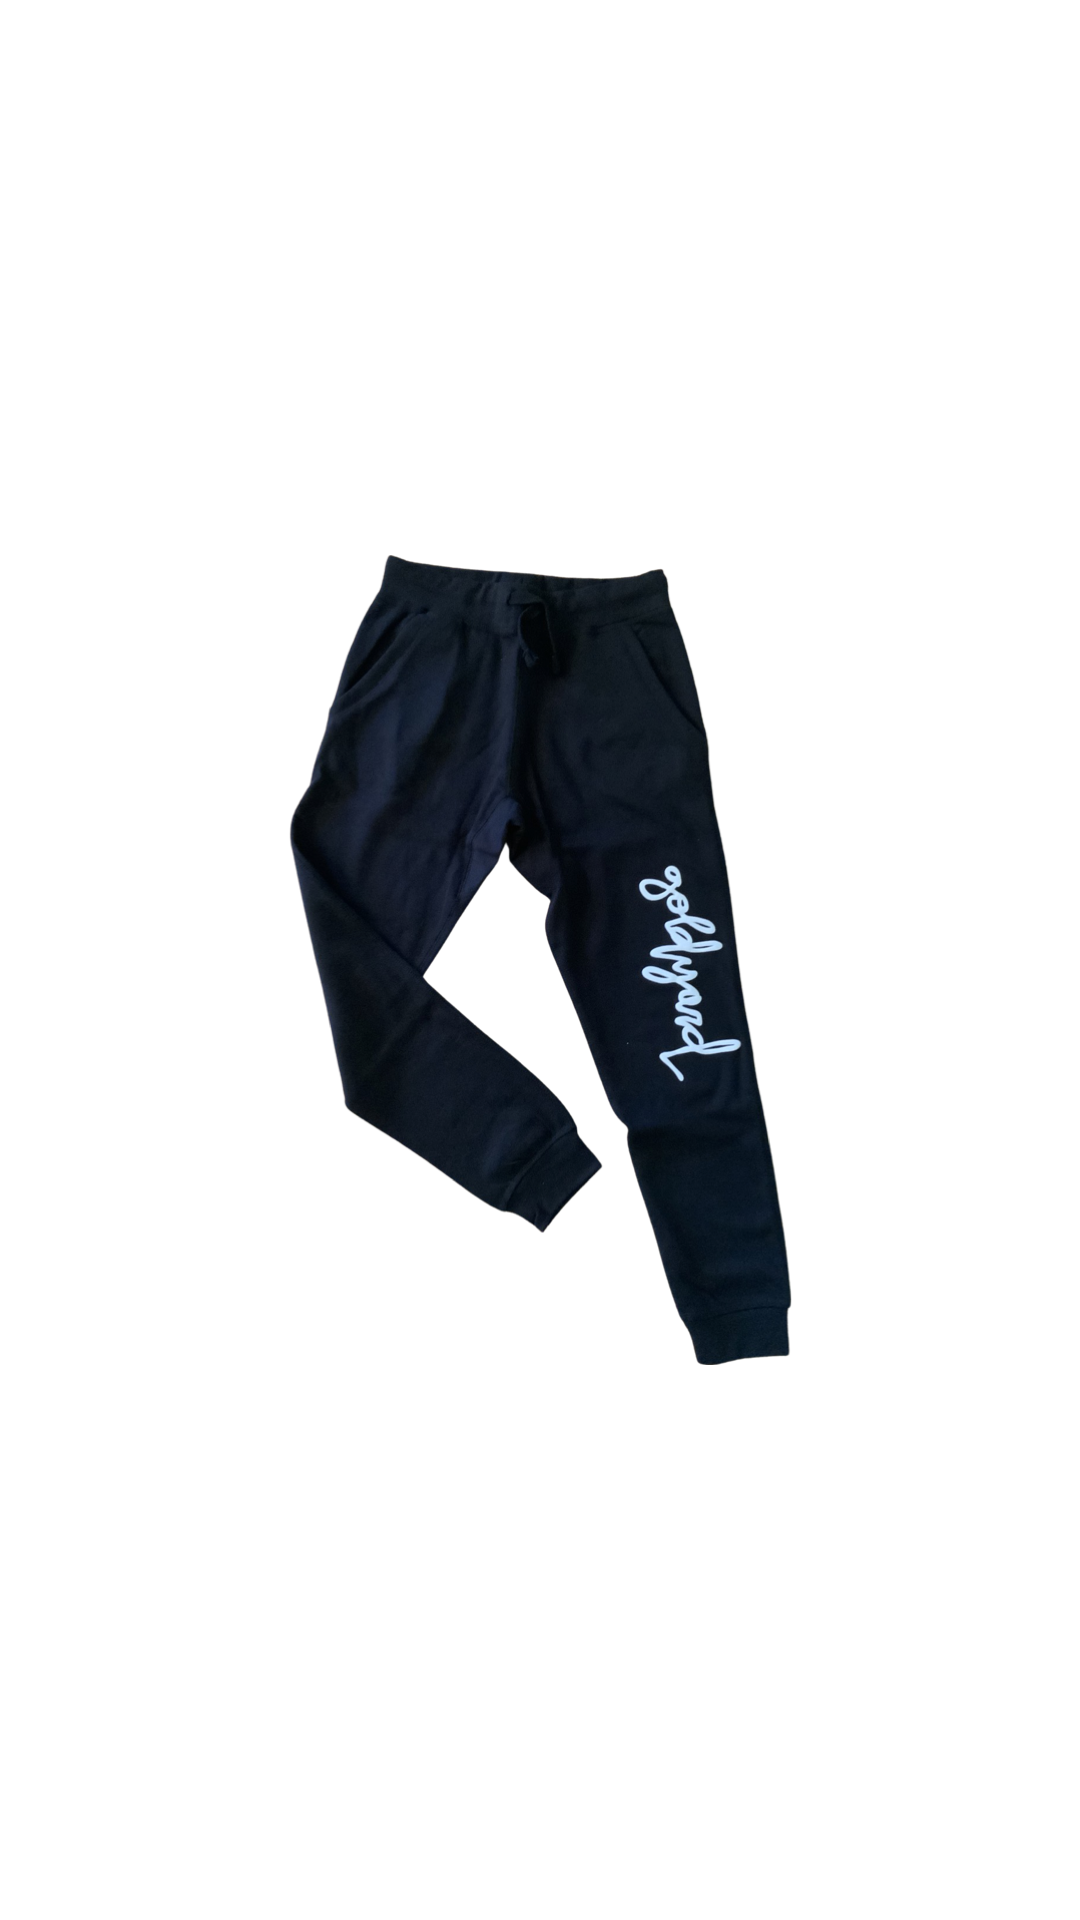 Image of Limited Edition Goldyard Sweatpants (B&W)